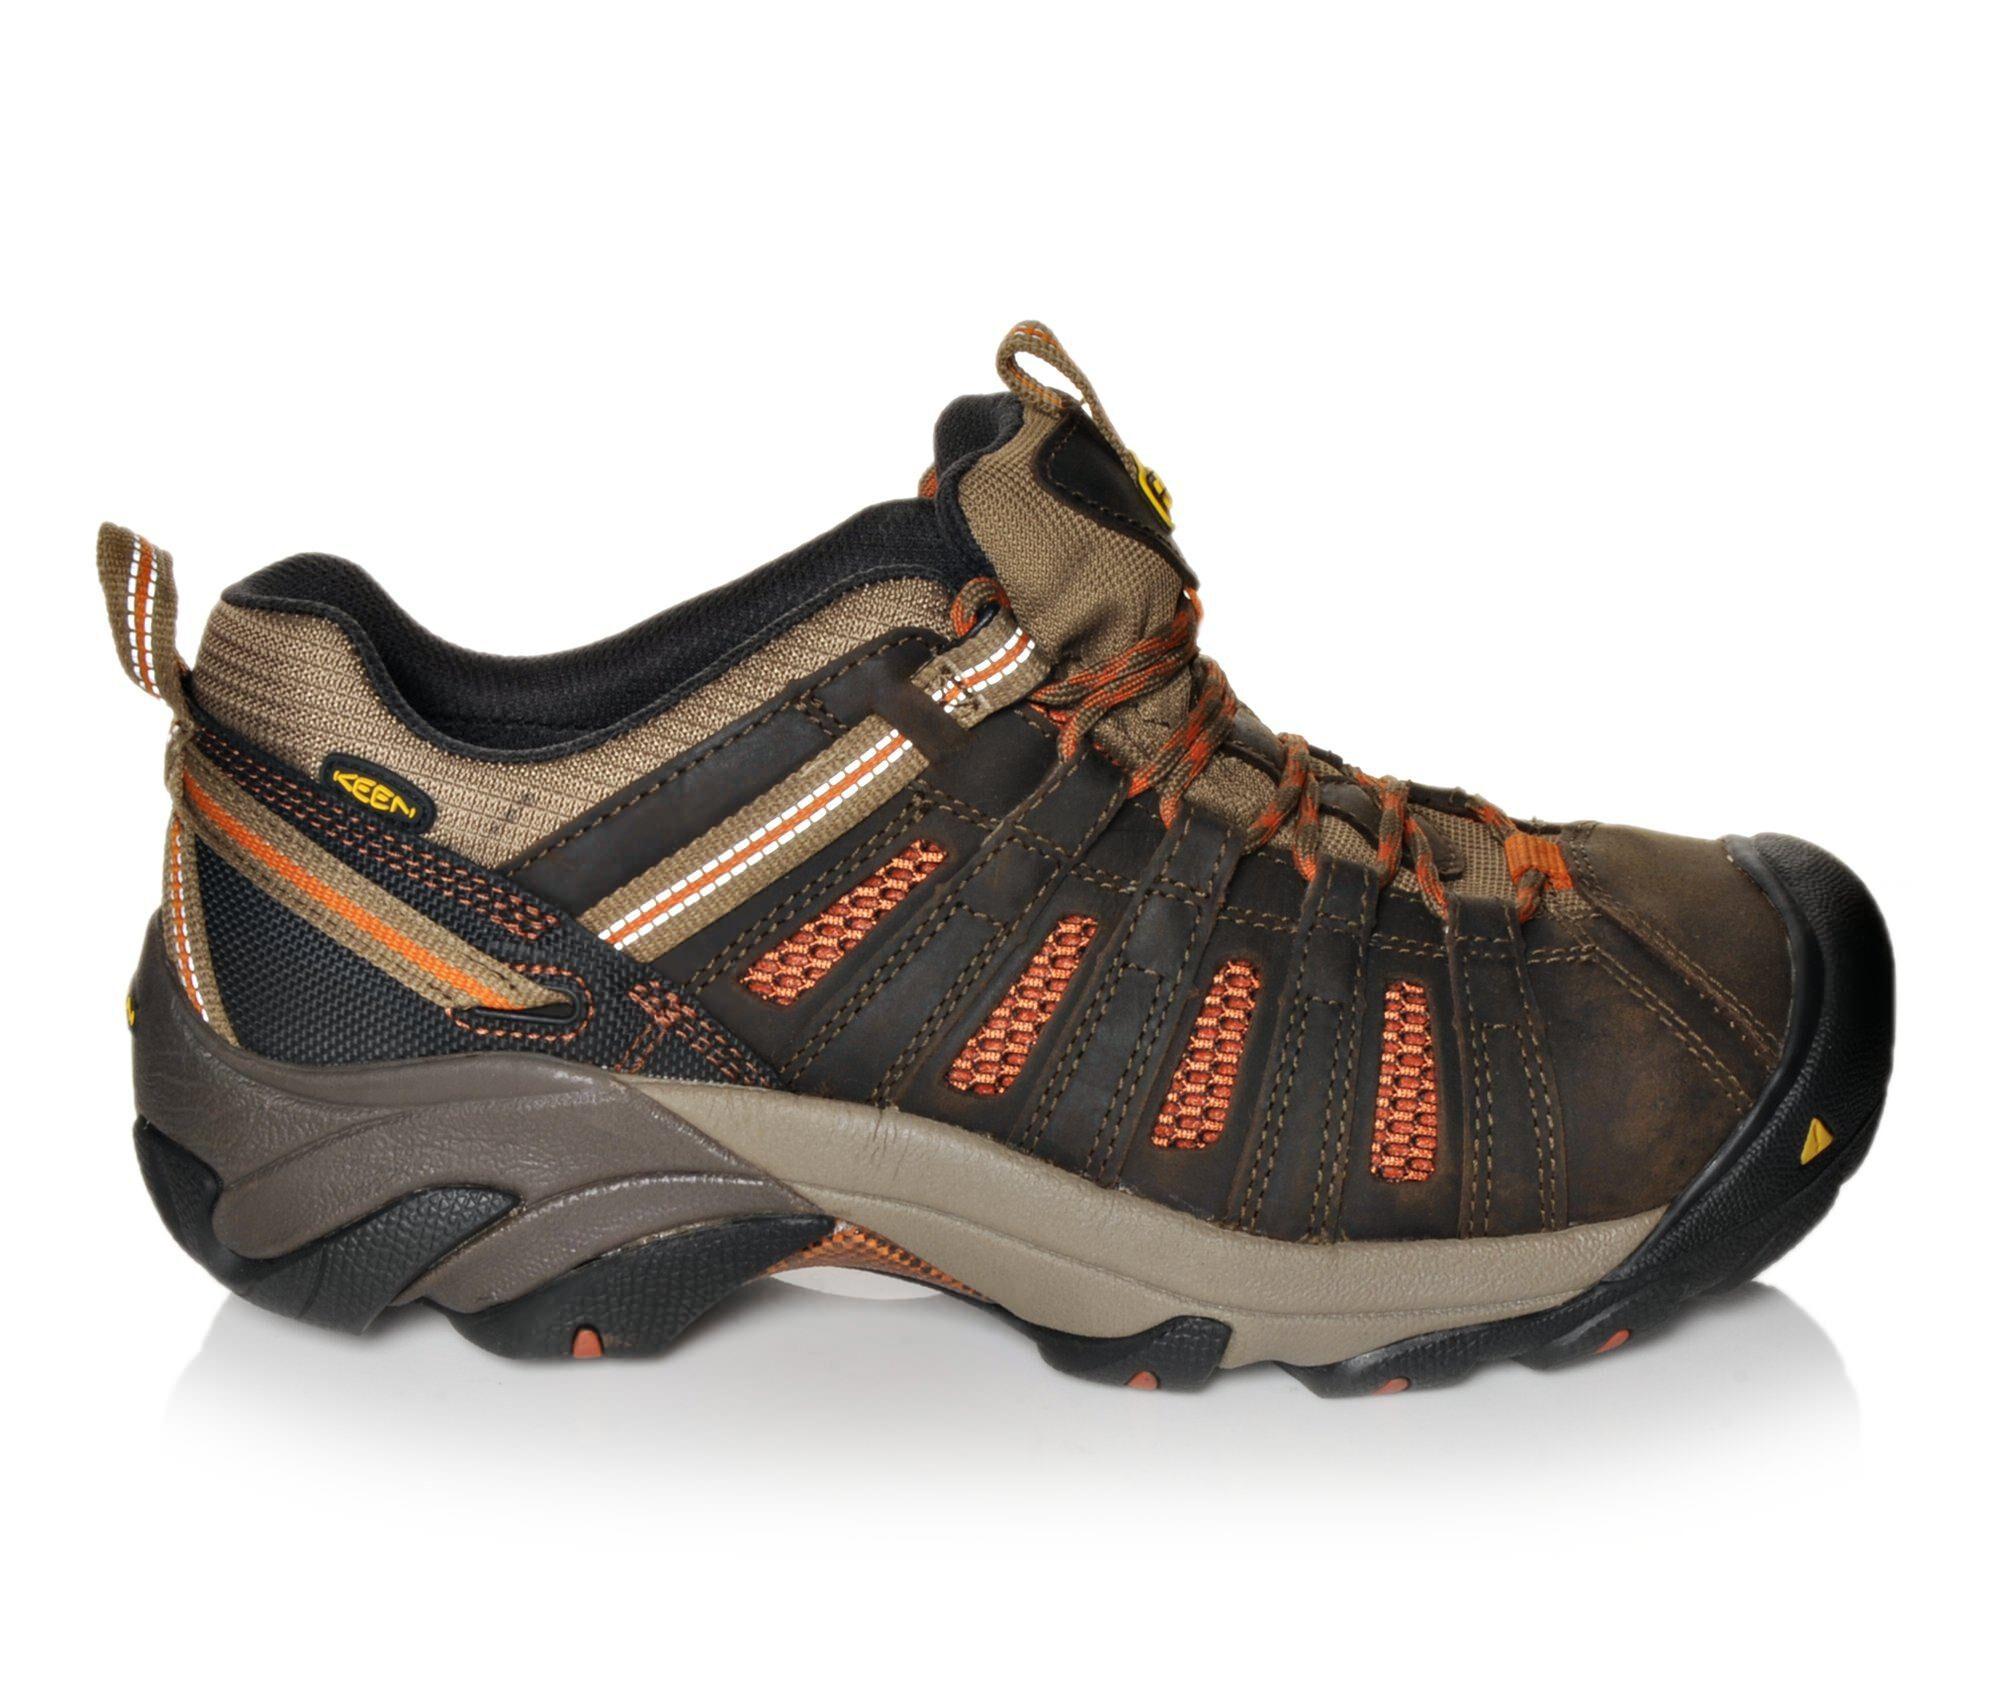 buy authentic new arrivals Men's KEEN Utility Flint Low Steel Toe Work Shoes Shittake/Rust